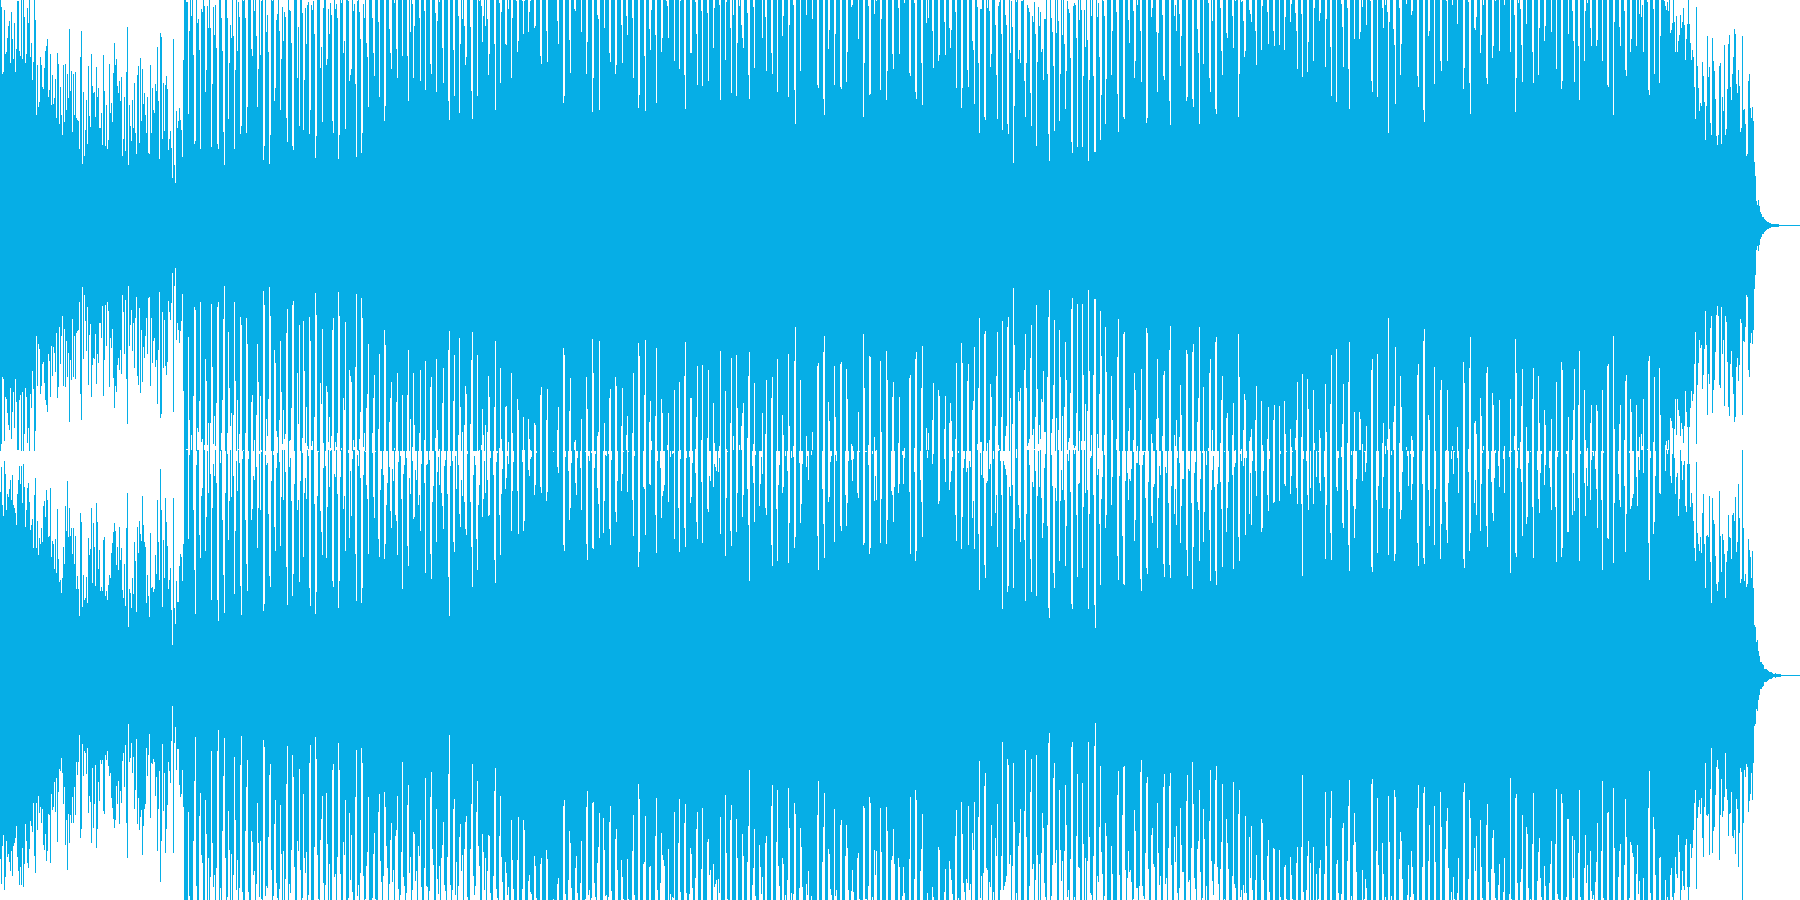 EDMクラブ系ダンスミュージック-85の再生済みの波形